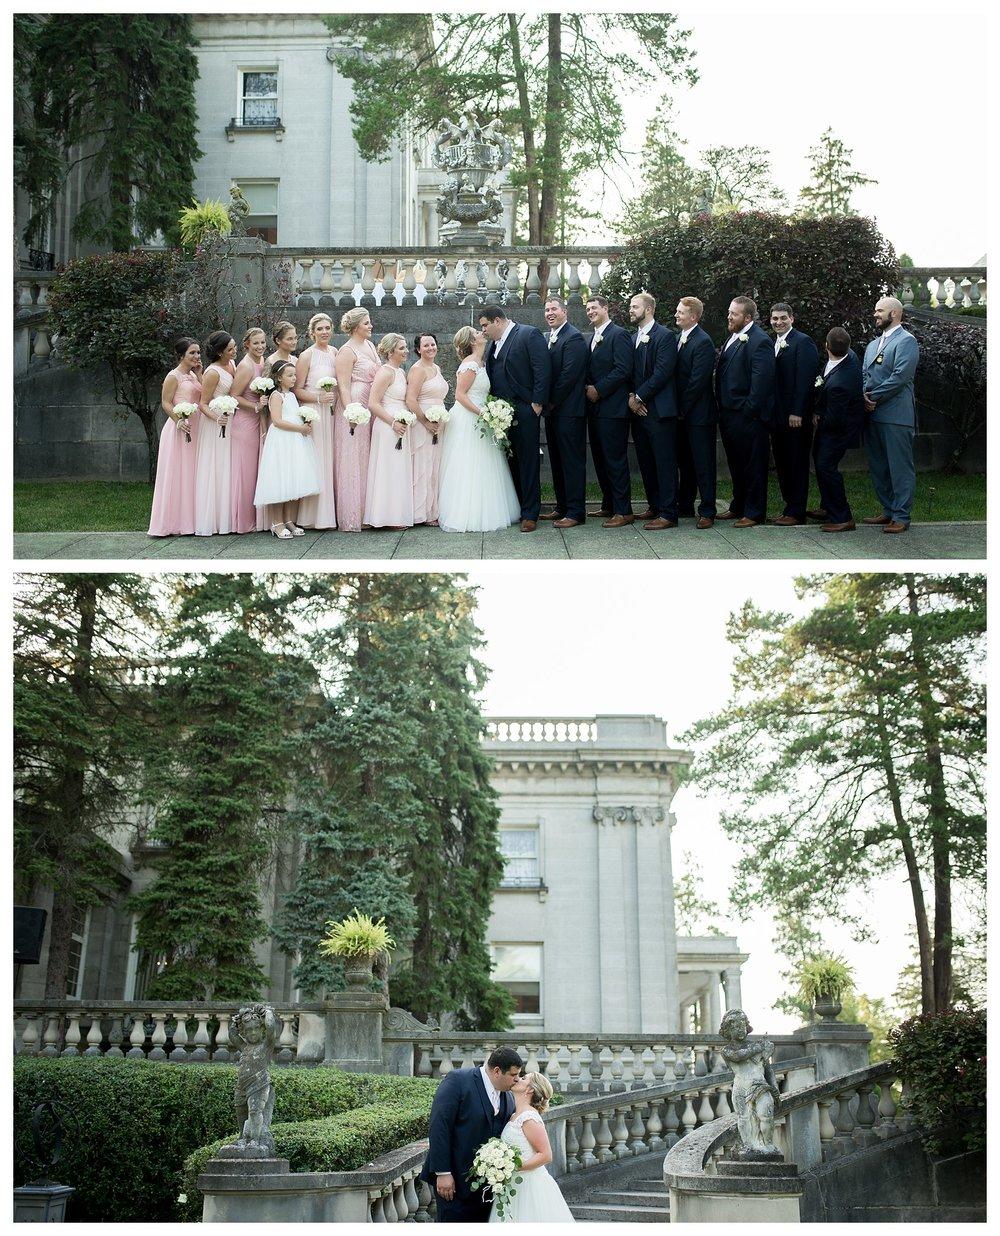 laurel-court-wedding-everleigh-photography-cincinnati-wedding-photographer-northern-ky-wedding-photographer-46